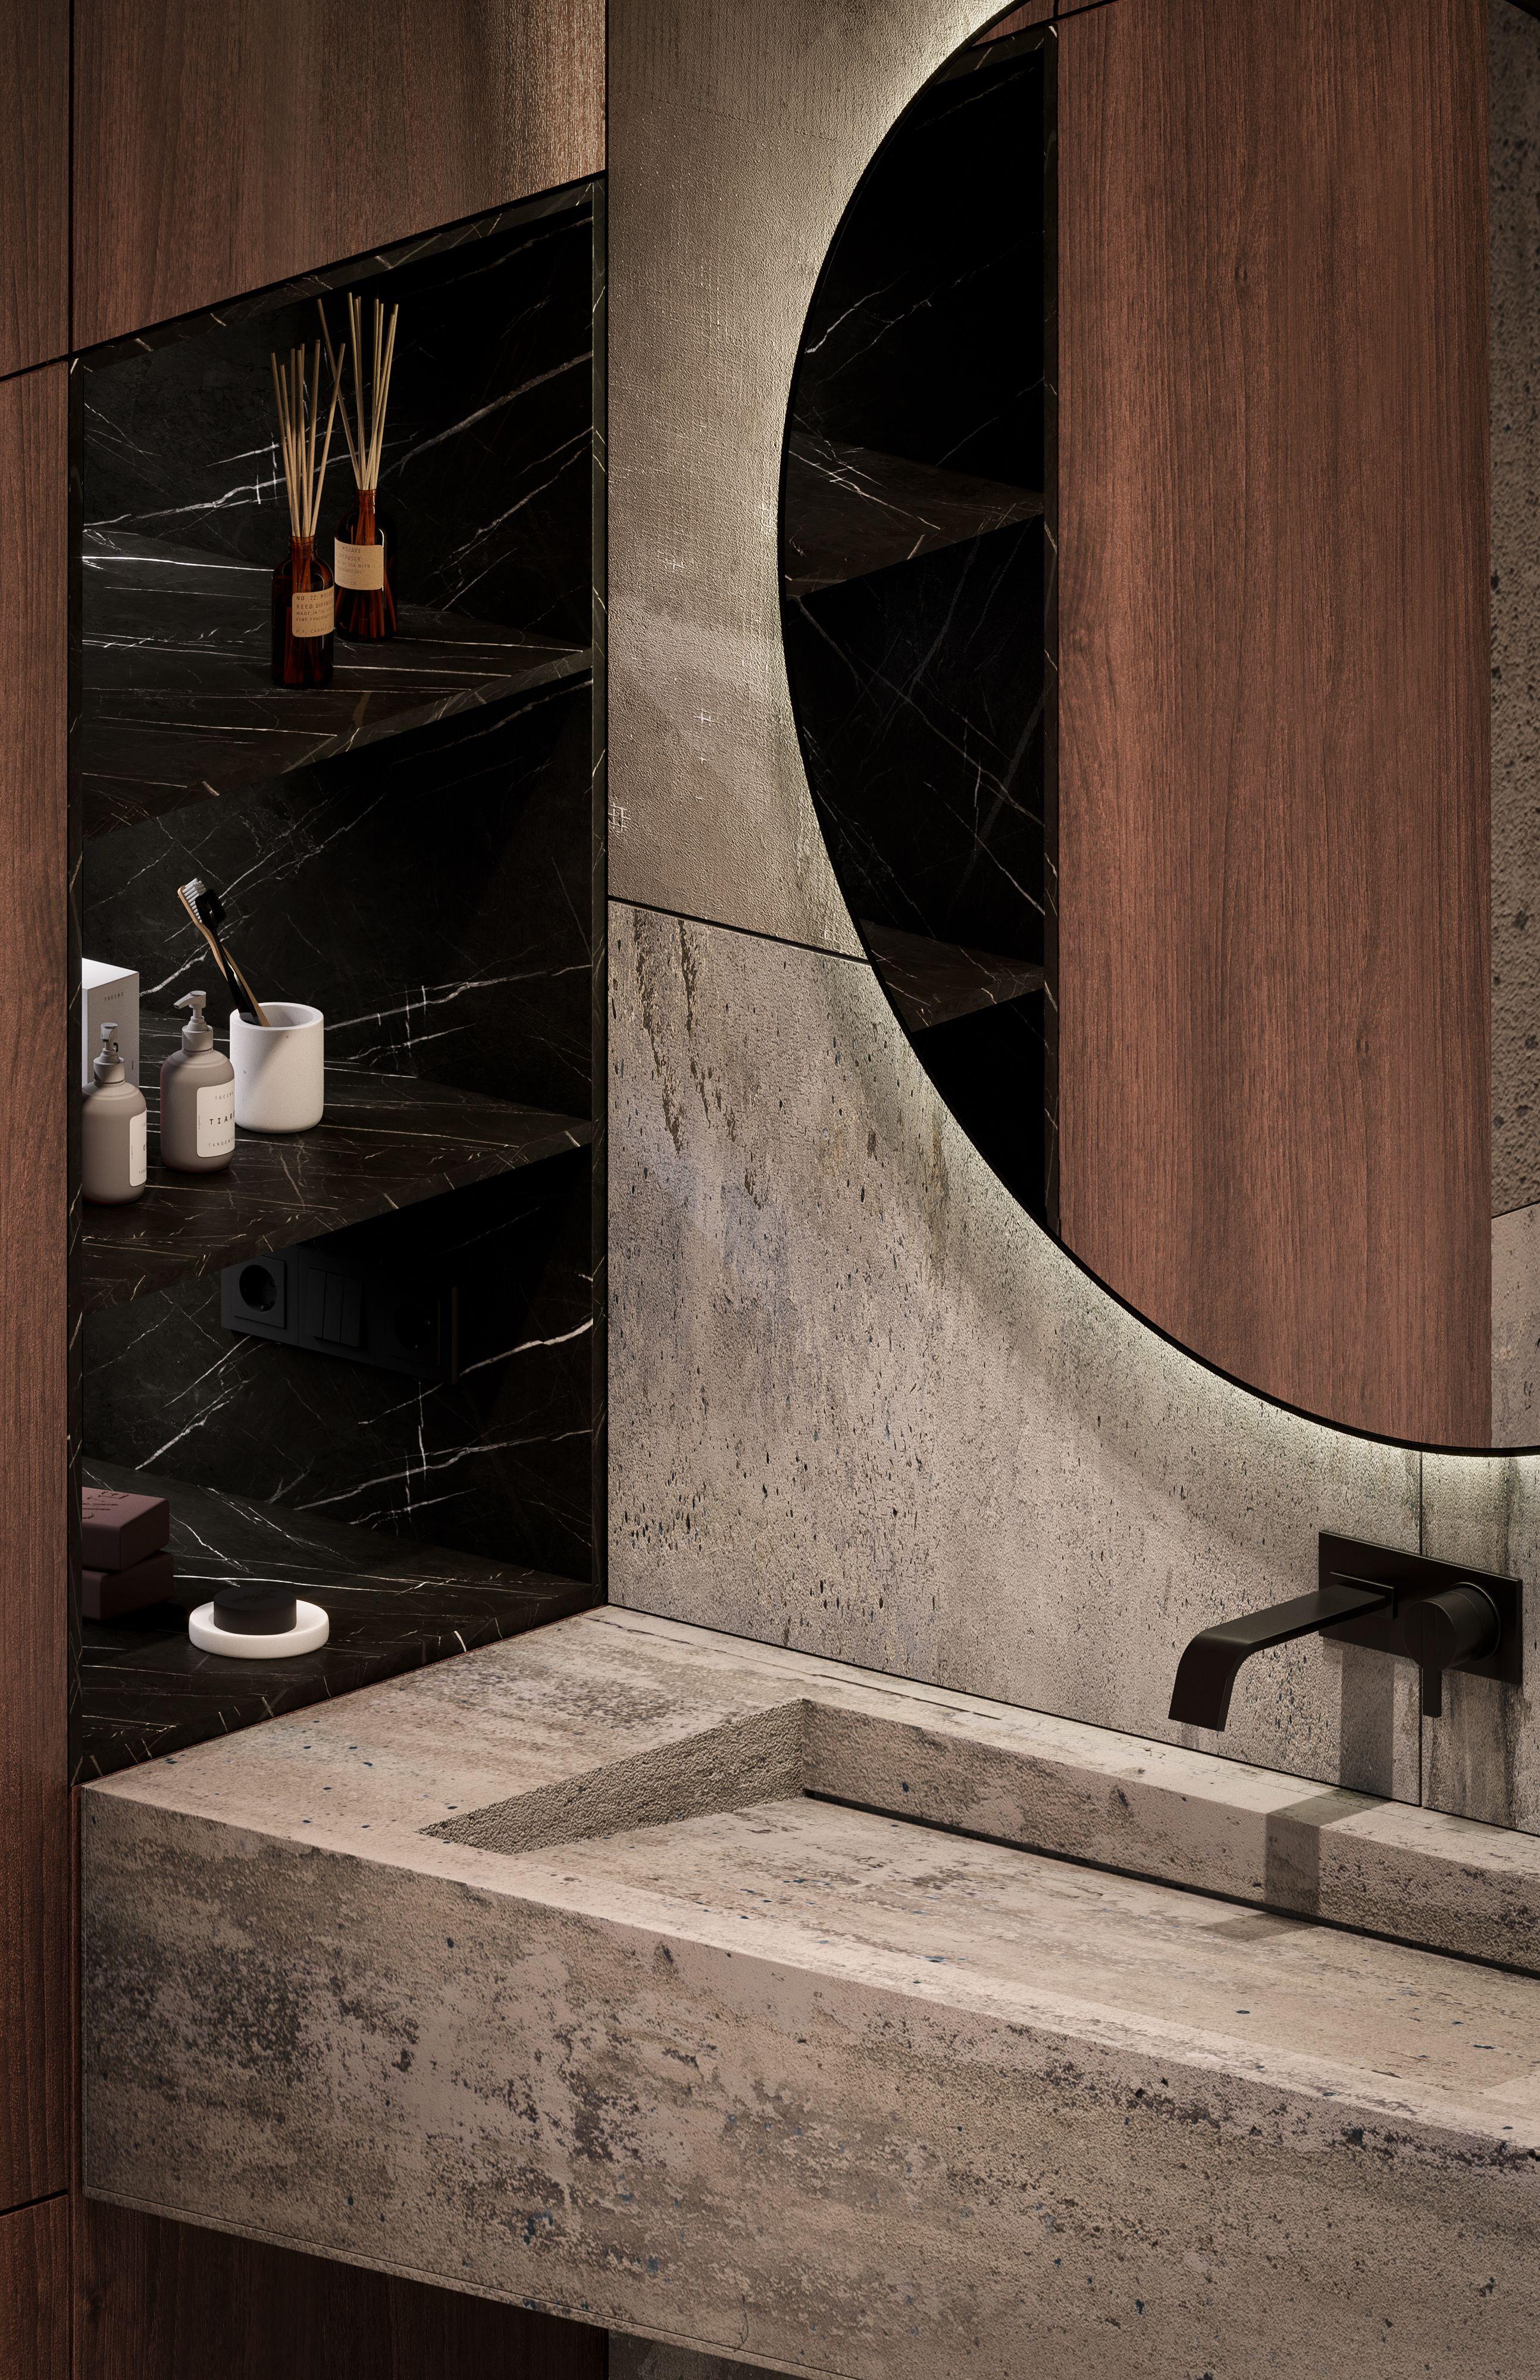 Arredamento Casa Roma roma house interior | buro511 on behance | arredamento d